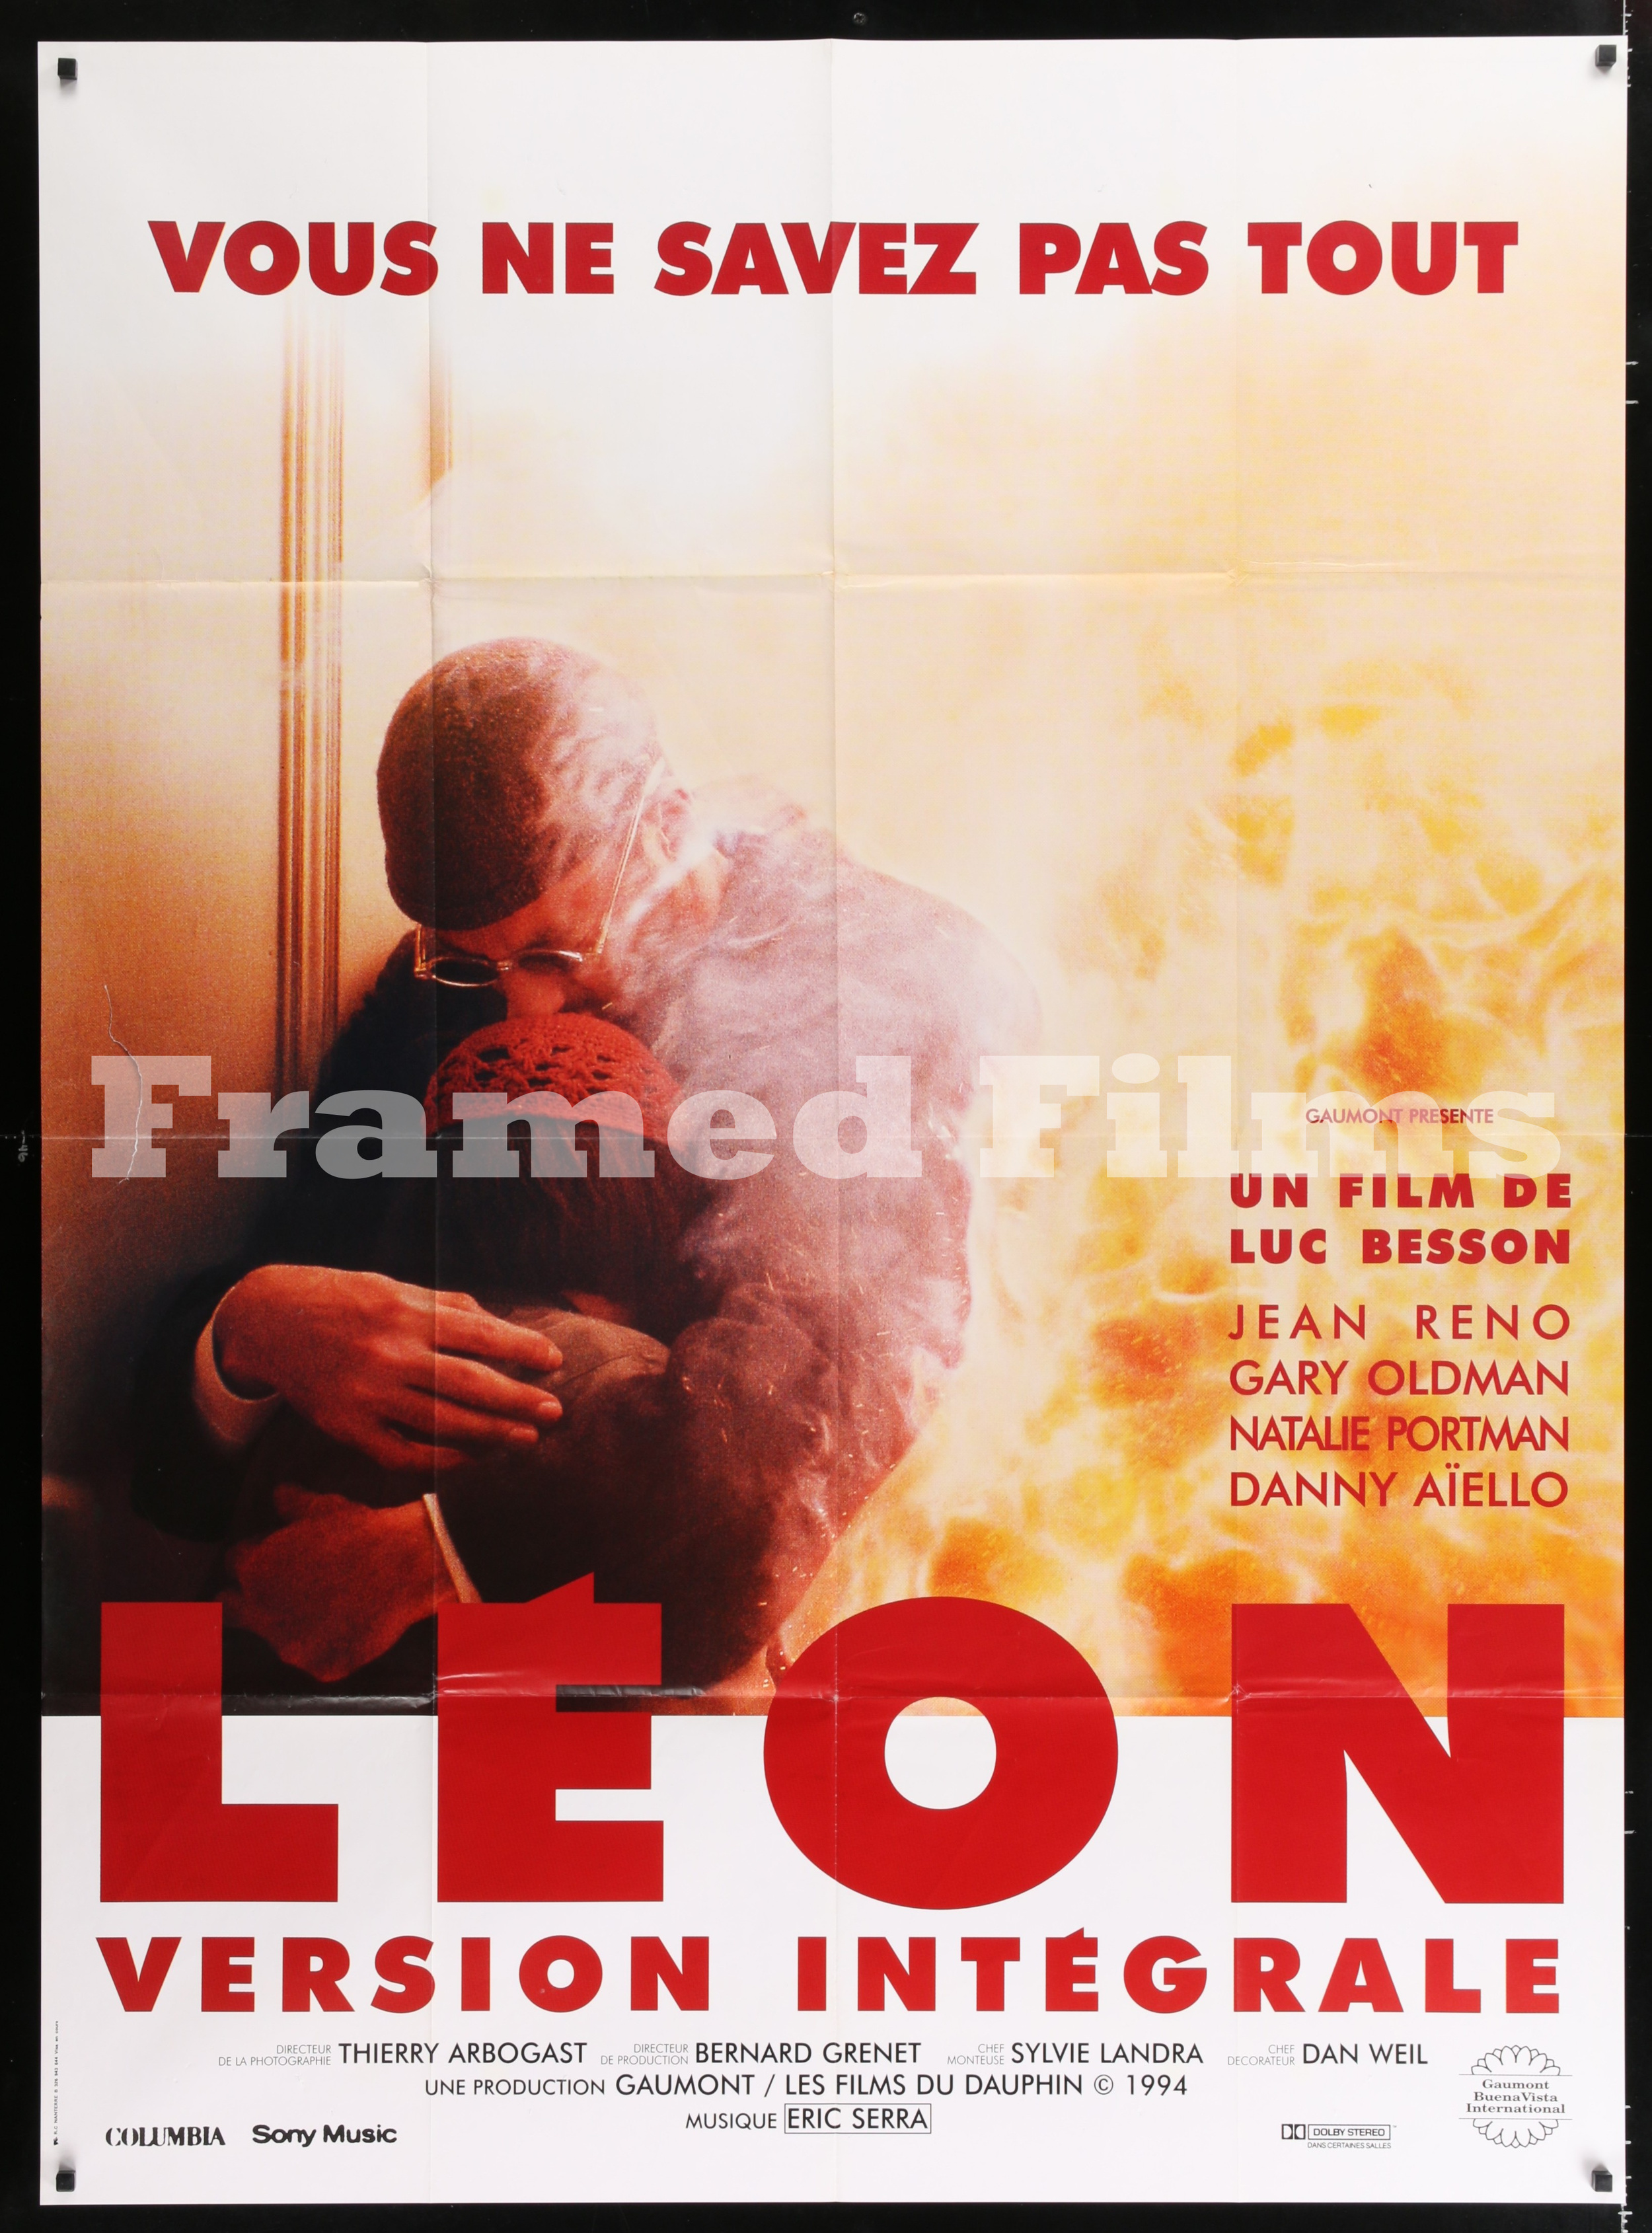 french_1p_professional_R96_BM02680_C.jpg